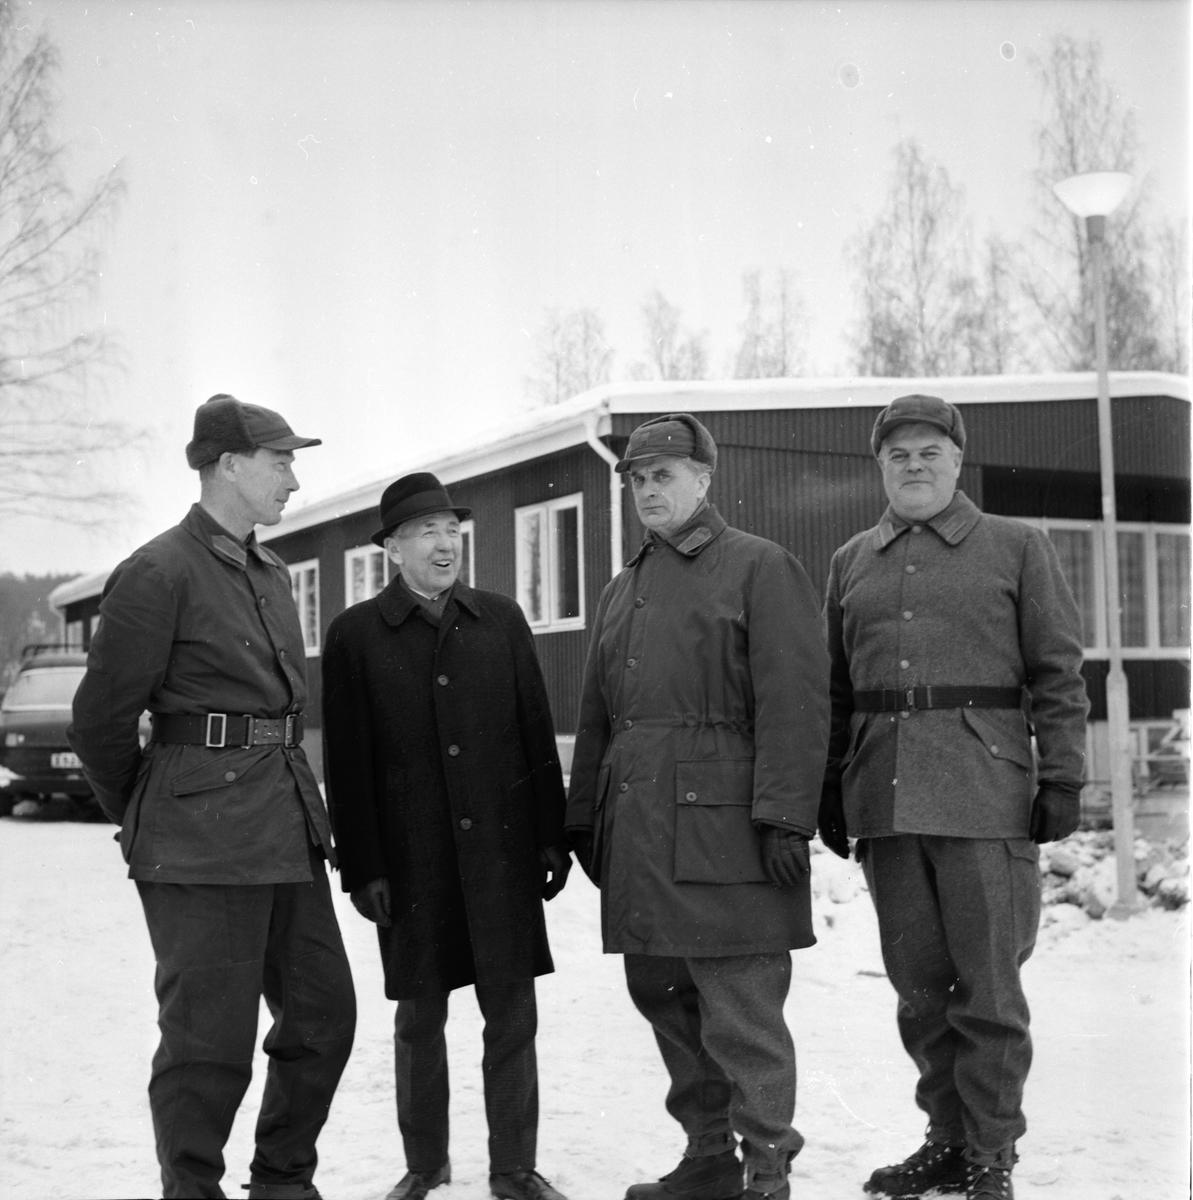 Stagården, Nygården, Ankarcrona, Westerlund 17 Februari 1967